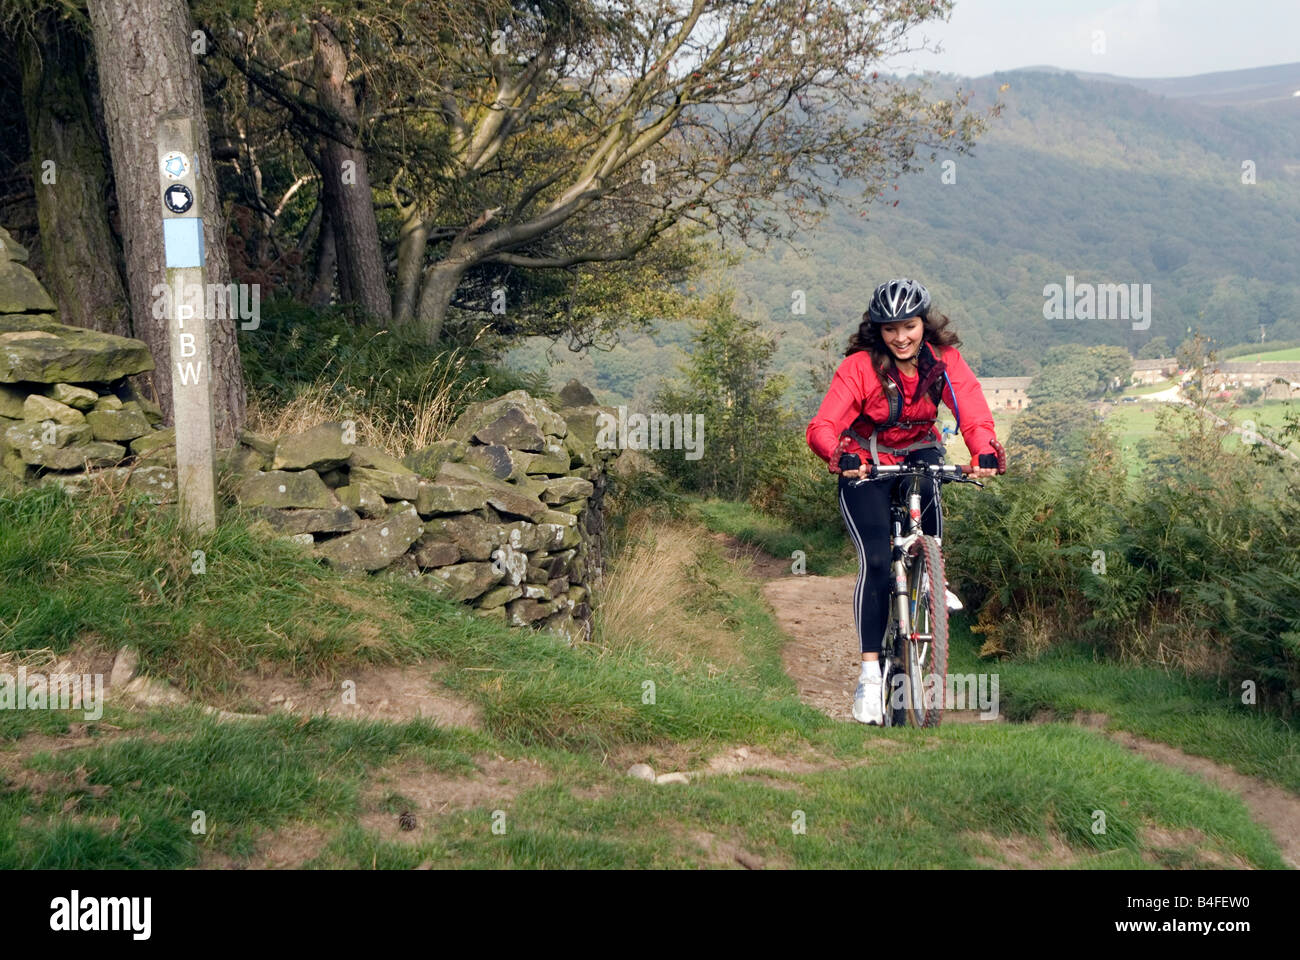 Mountain biking Hayfield Peak District National Park Derbyshire England UK GB Stock Photo